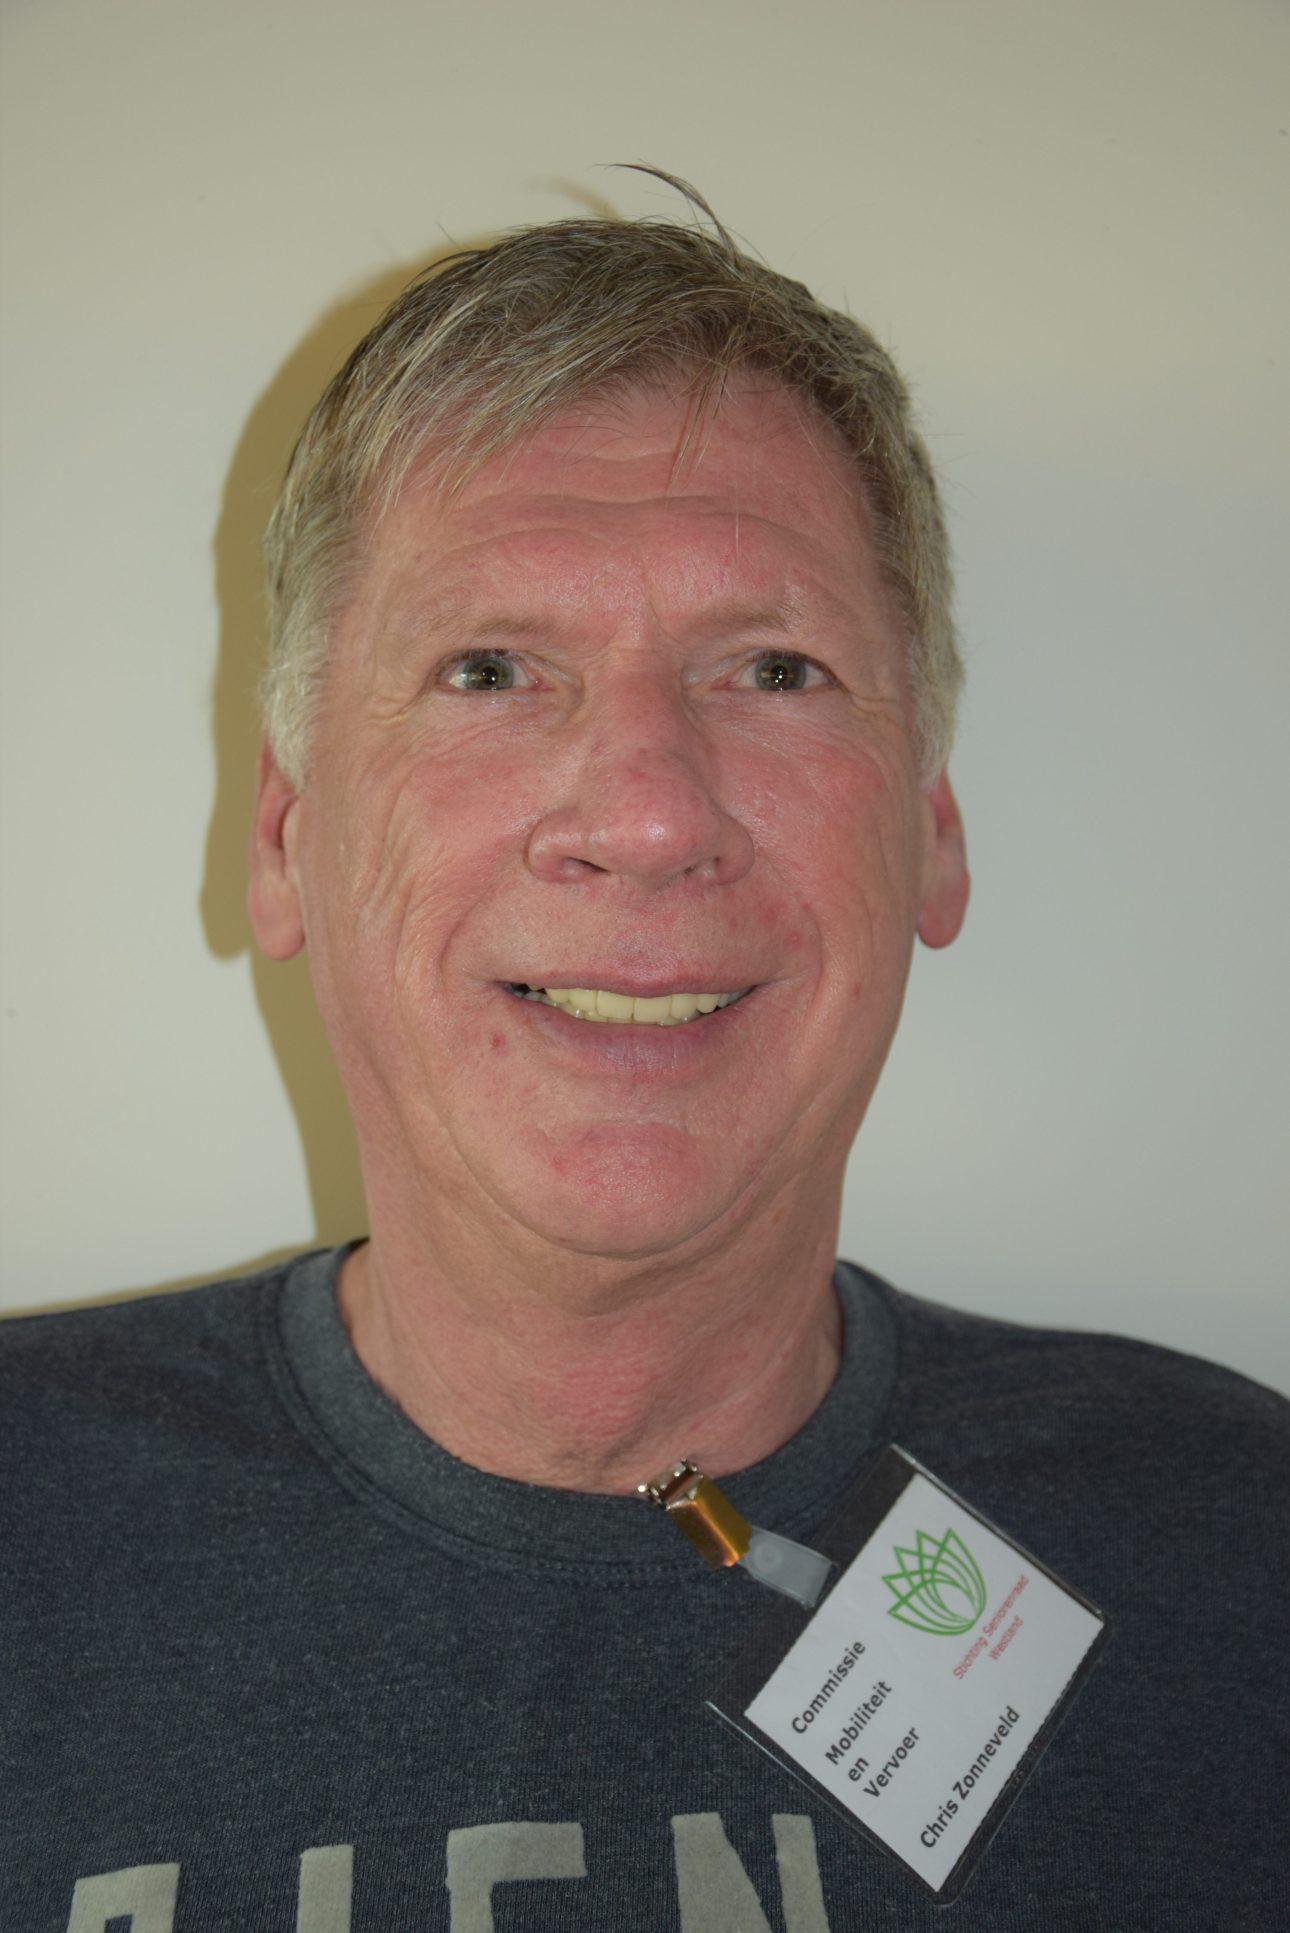 Chris Zonneveld